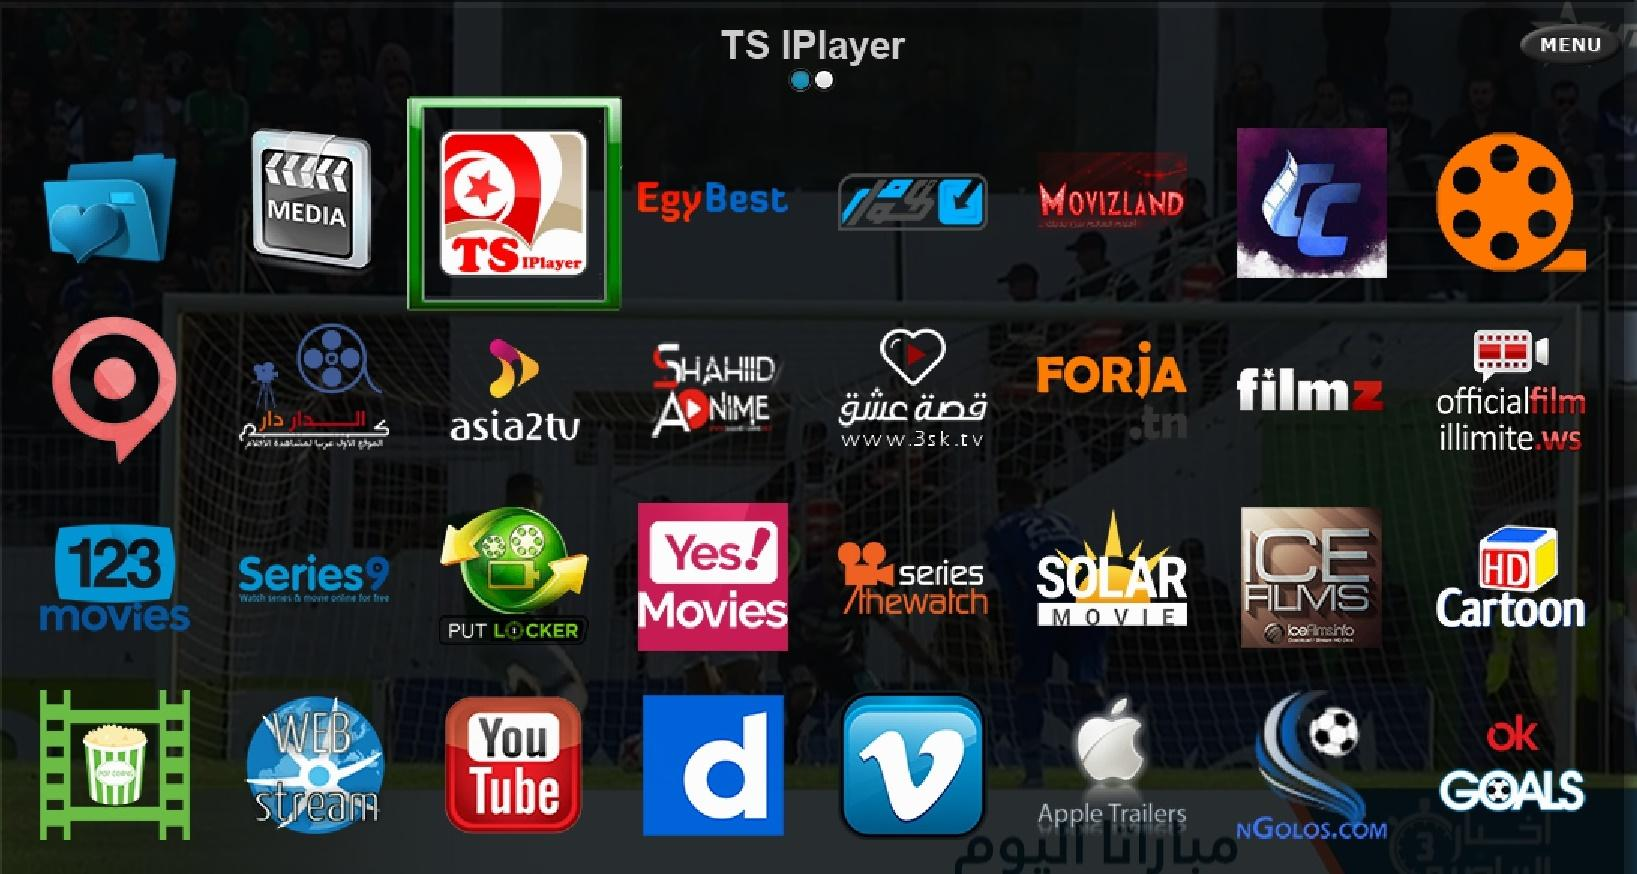 TSplayer إضافة عربية جديدة داخل بلوغين E2iplayer خاص ب Enigma2